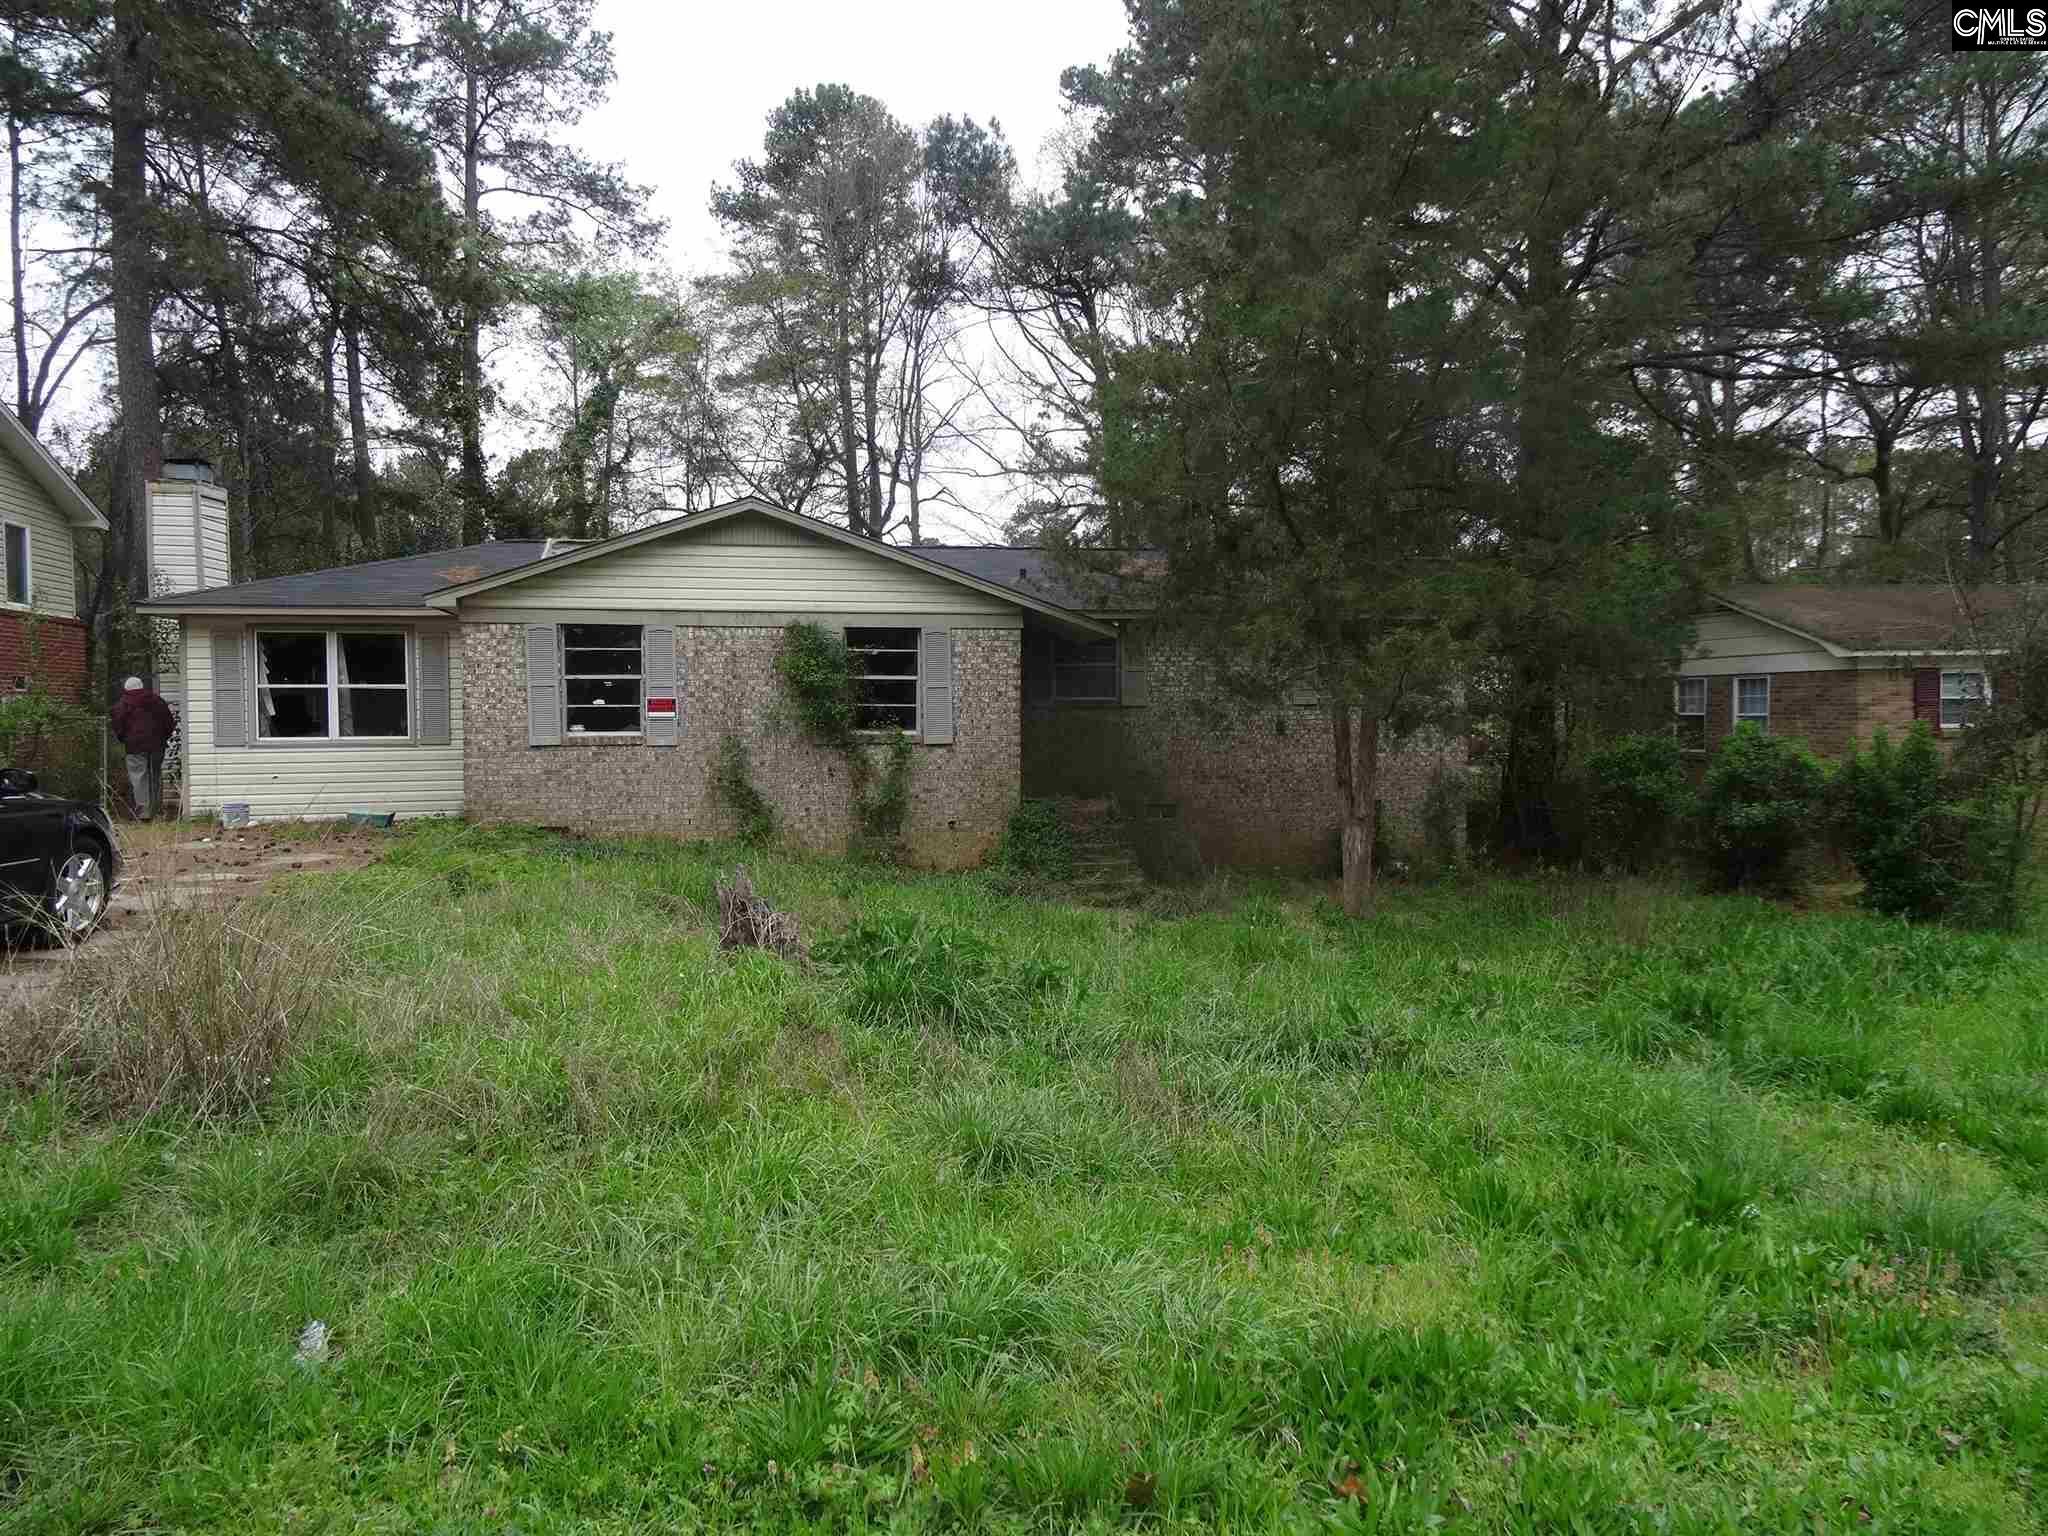 412  Saddlefield Columbia, SC 29203-1462